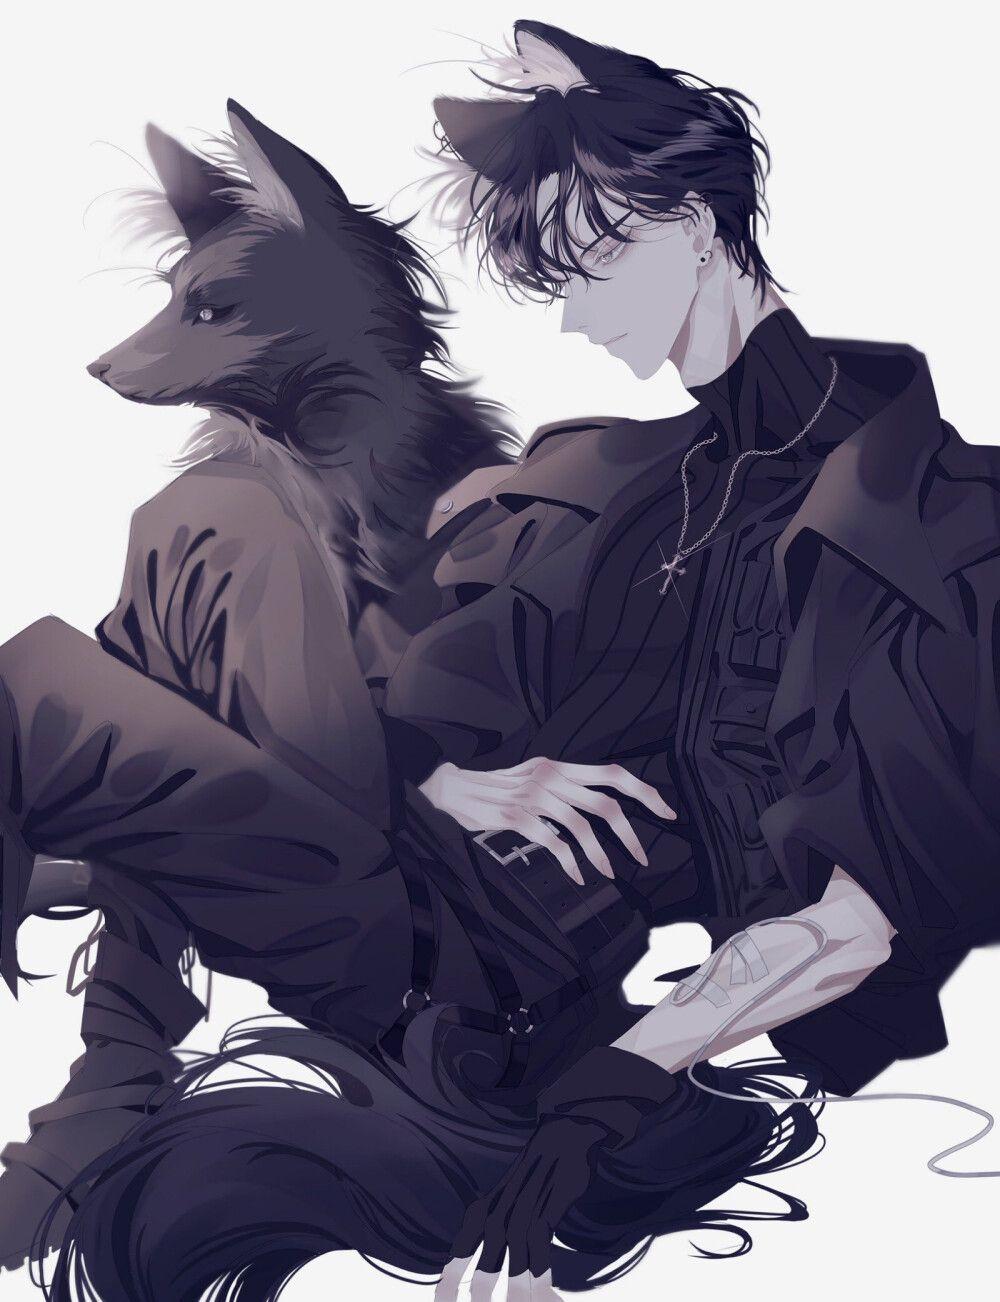 Pin By Mih On Art Nam In 2020 Dark Anime Guys Cute Anime Guys Cool Anime Guys